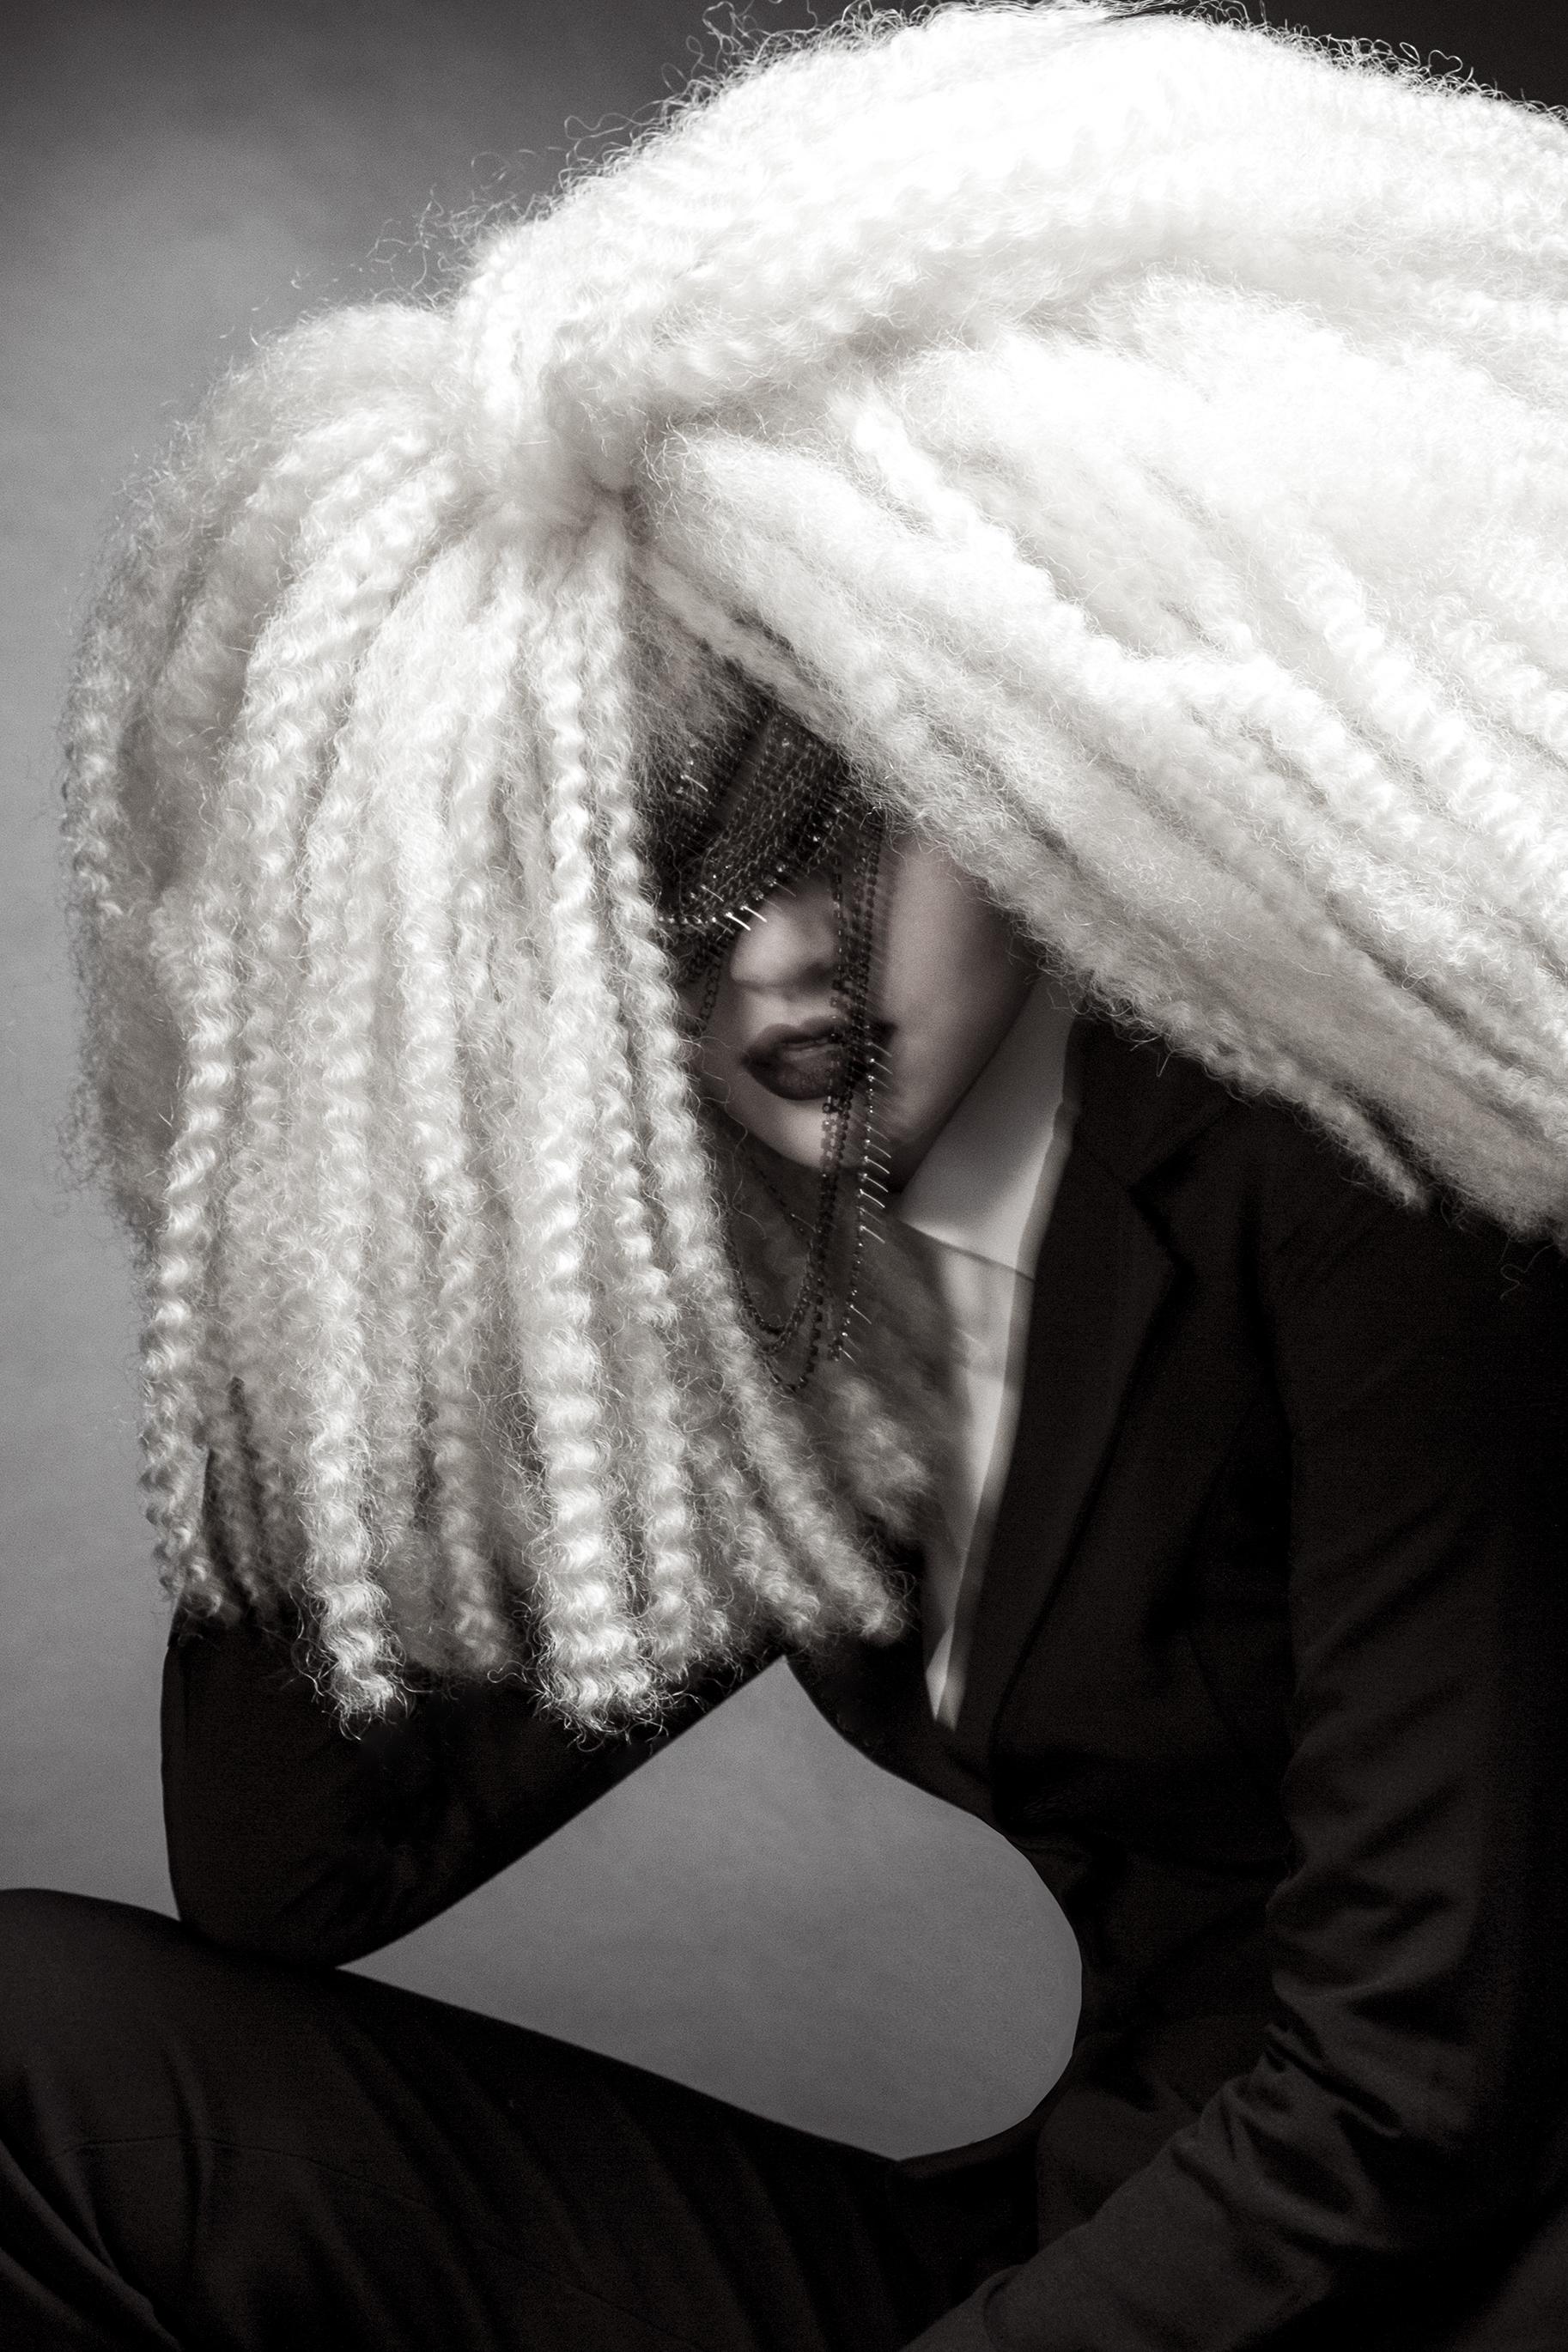 fashion-edgy-editorial-dark-gothic-bighair-platinum-blonde-moody-leather-sleek-black-beuty-hombre-makeup-redlip01.jpg